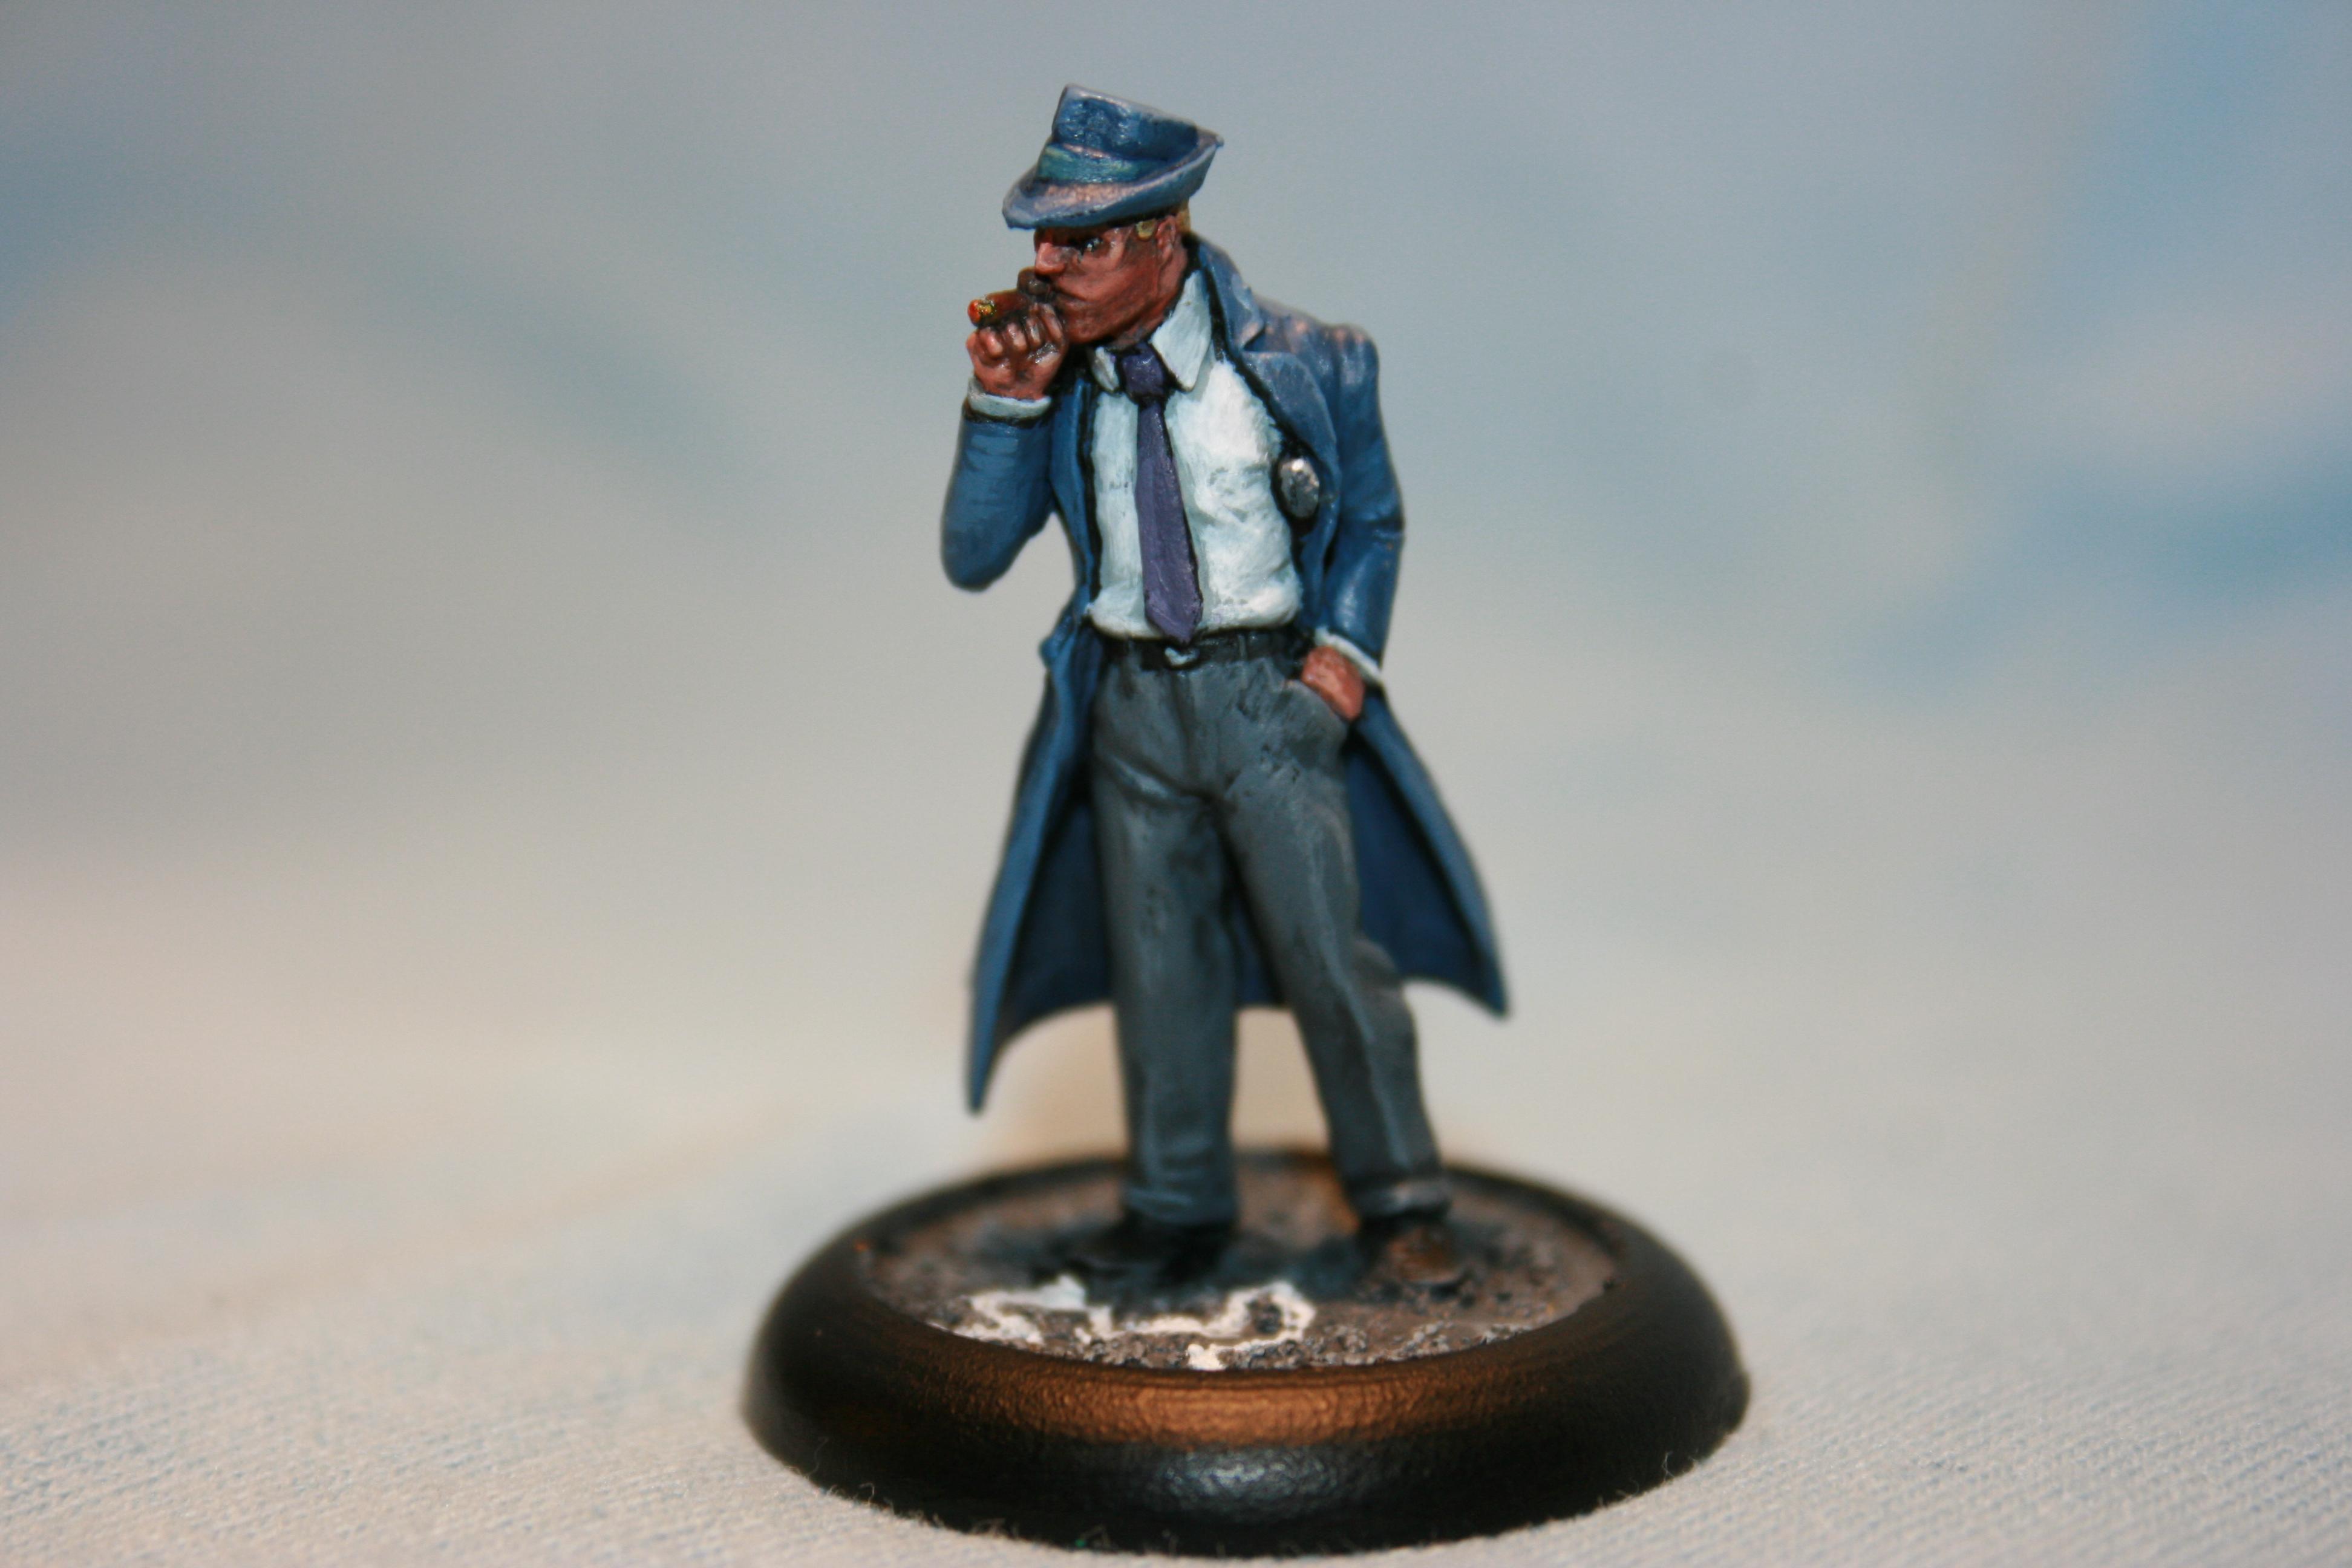 G-man, Private Eye, Reaper